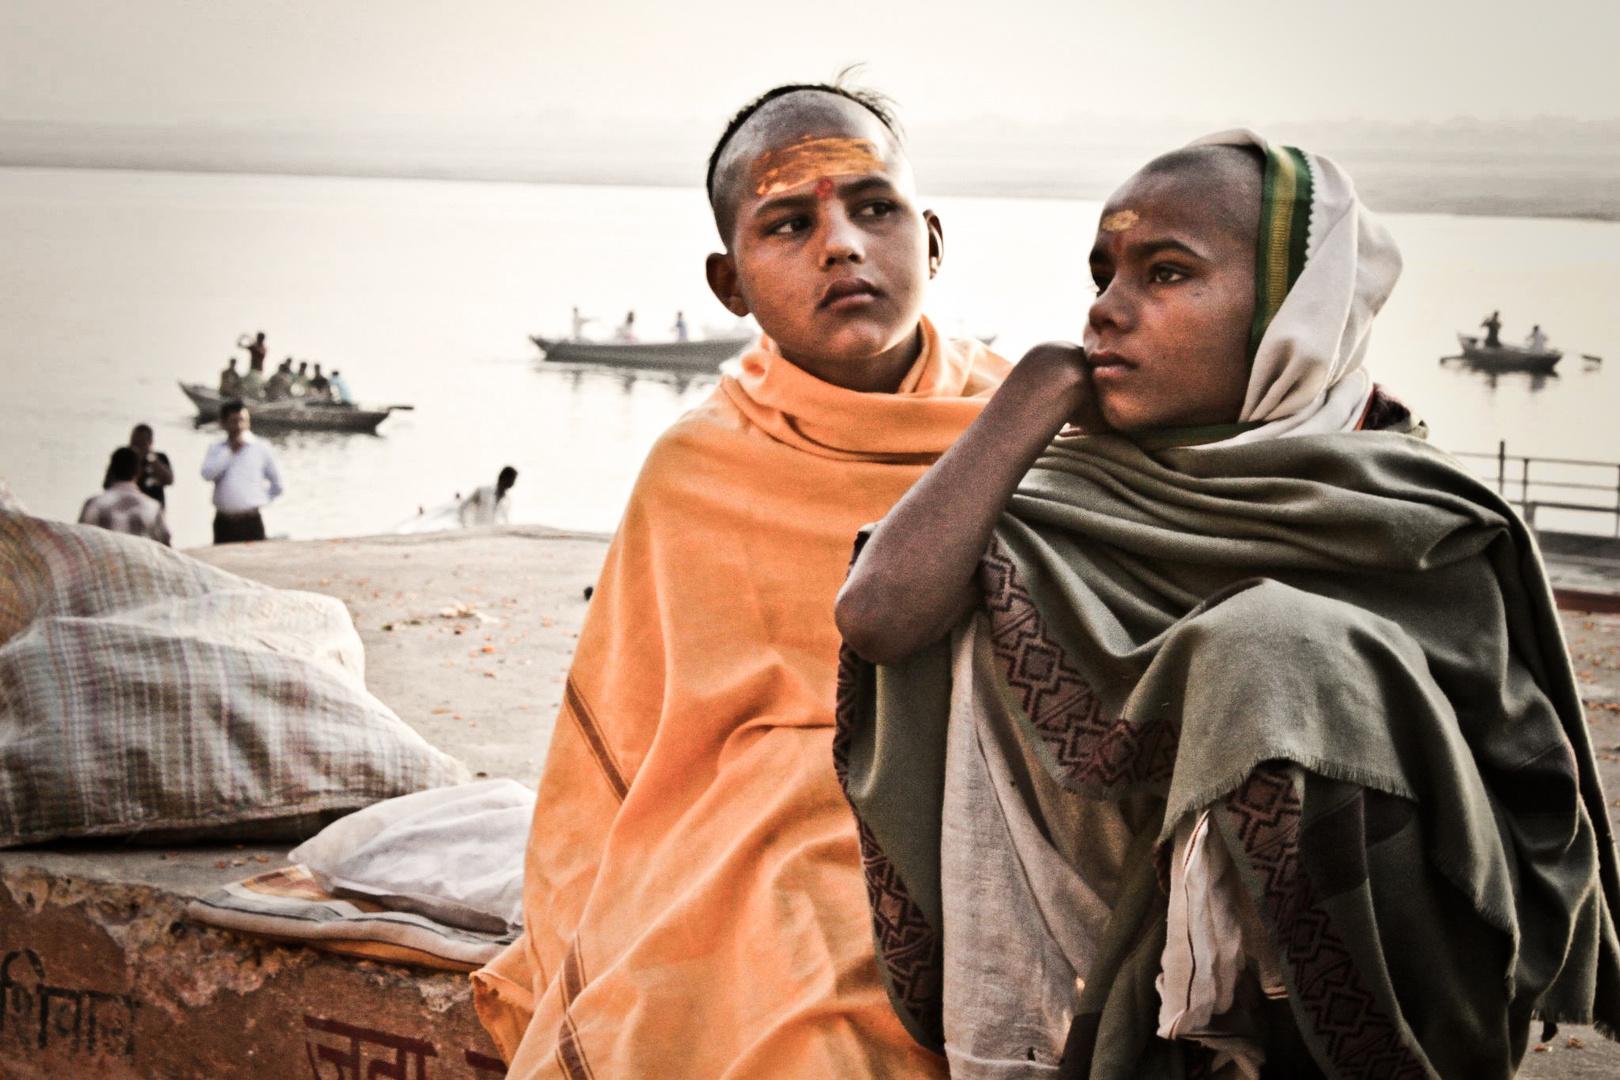 Varanasi - Verträumte Yoga Schüler am Ganges